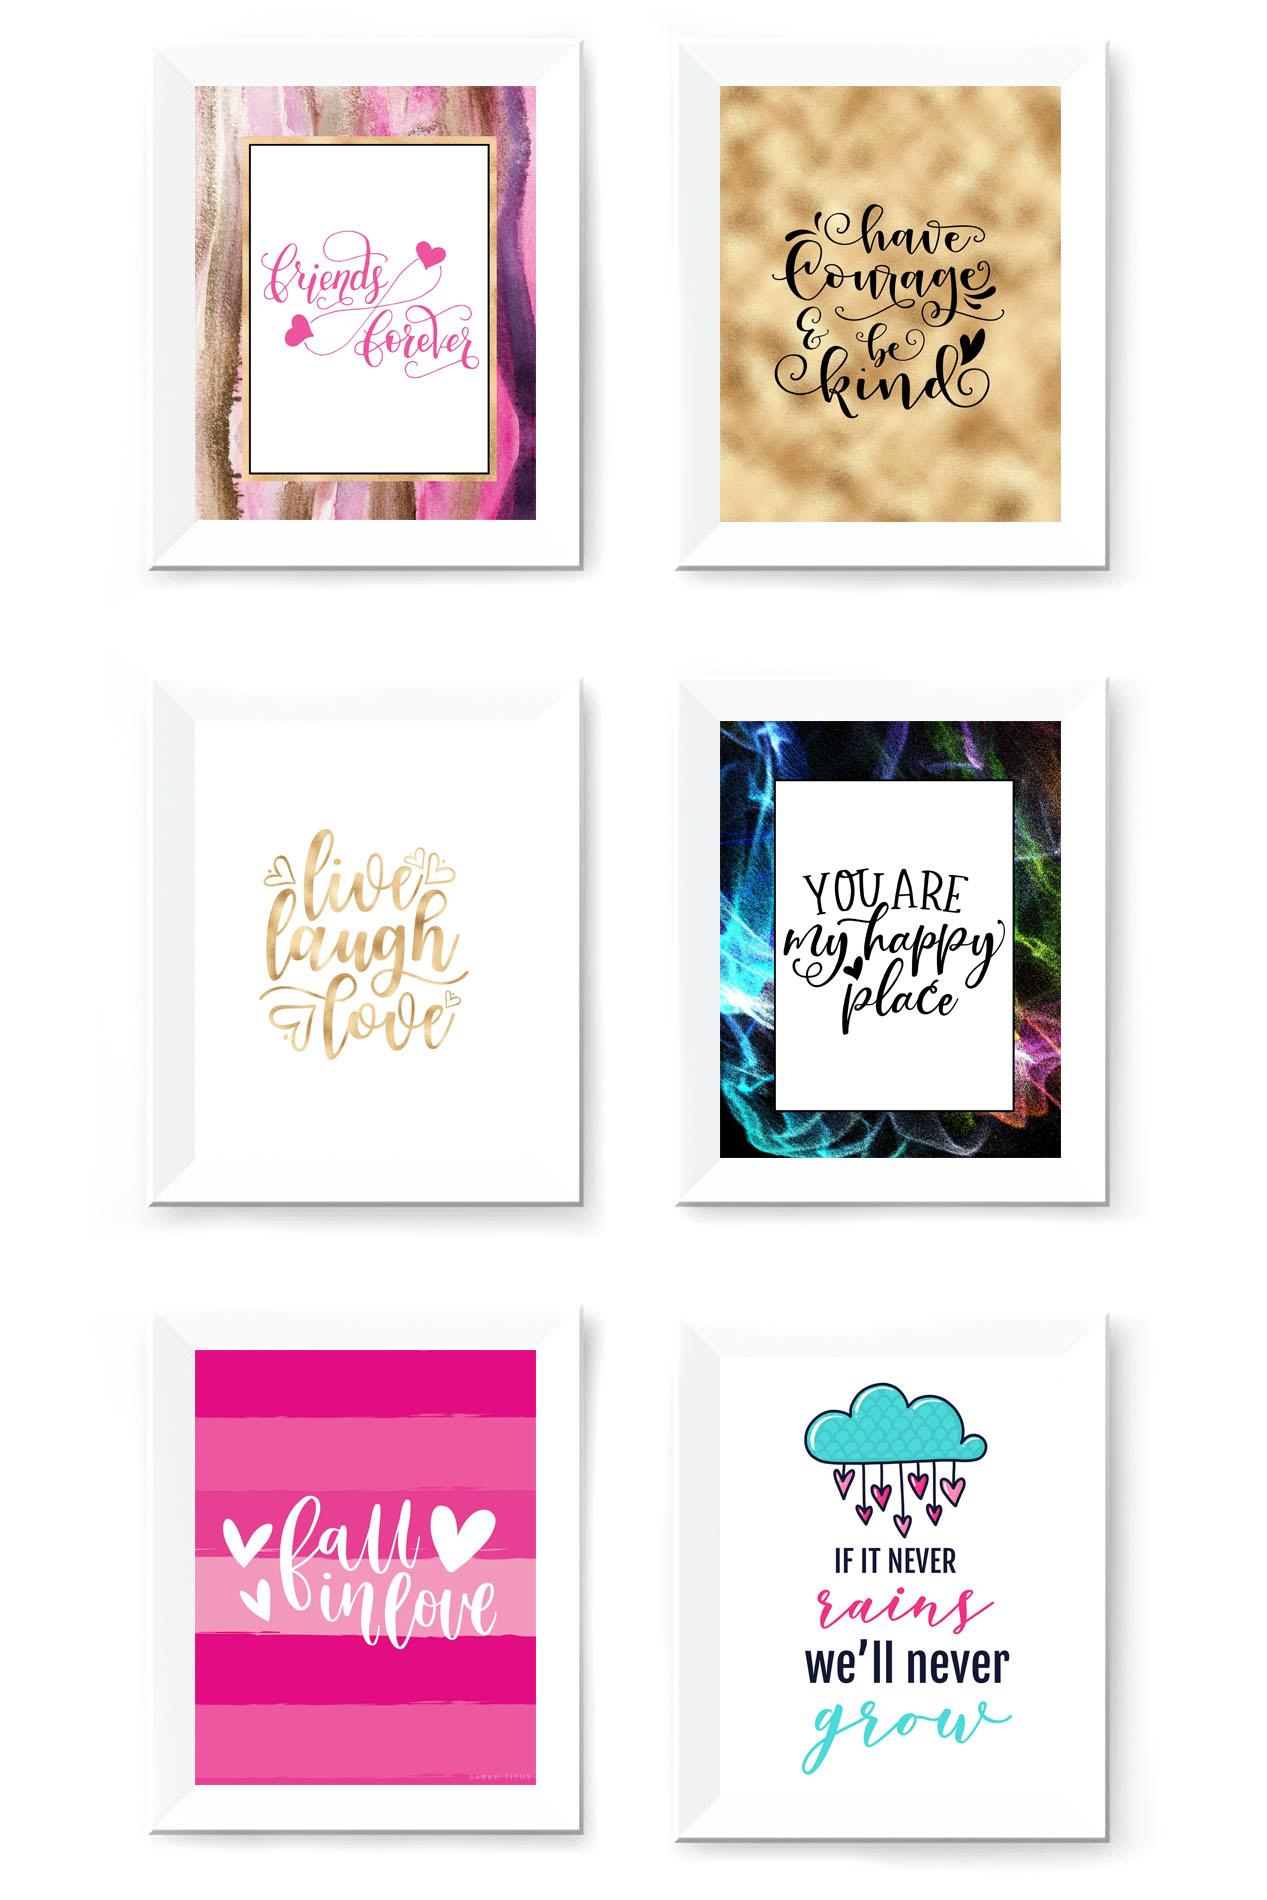 Free Printable Wall Art To Download Now - Sarah Titus - Free Printable Wall Art